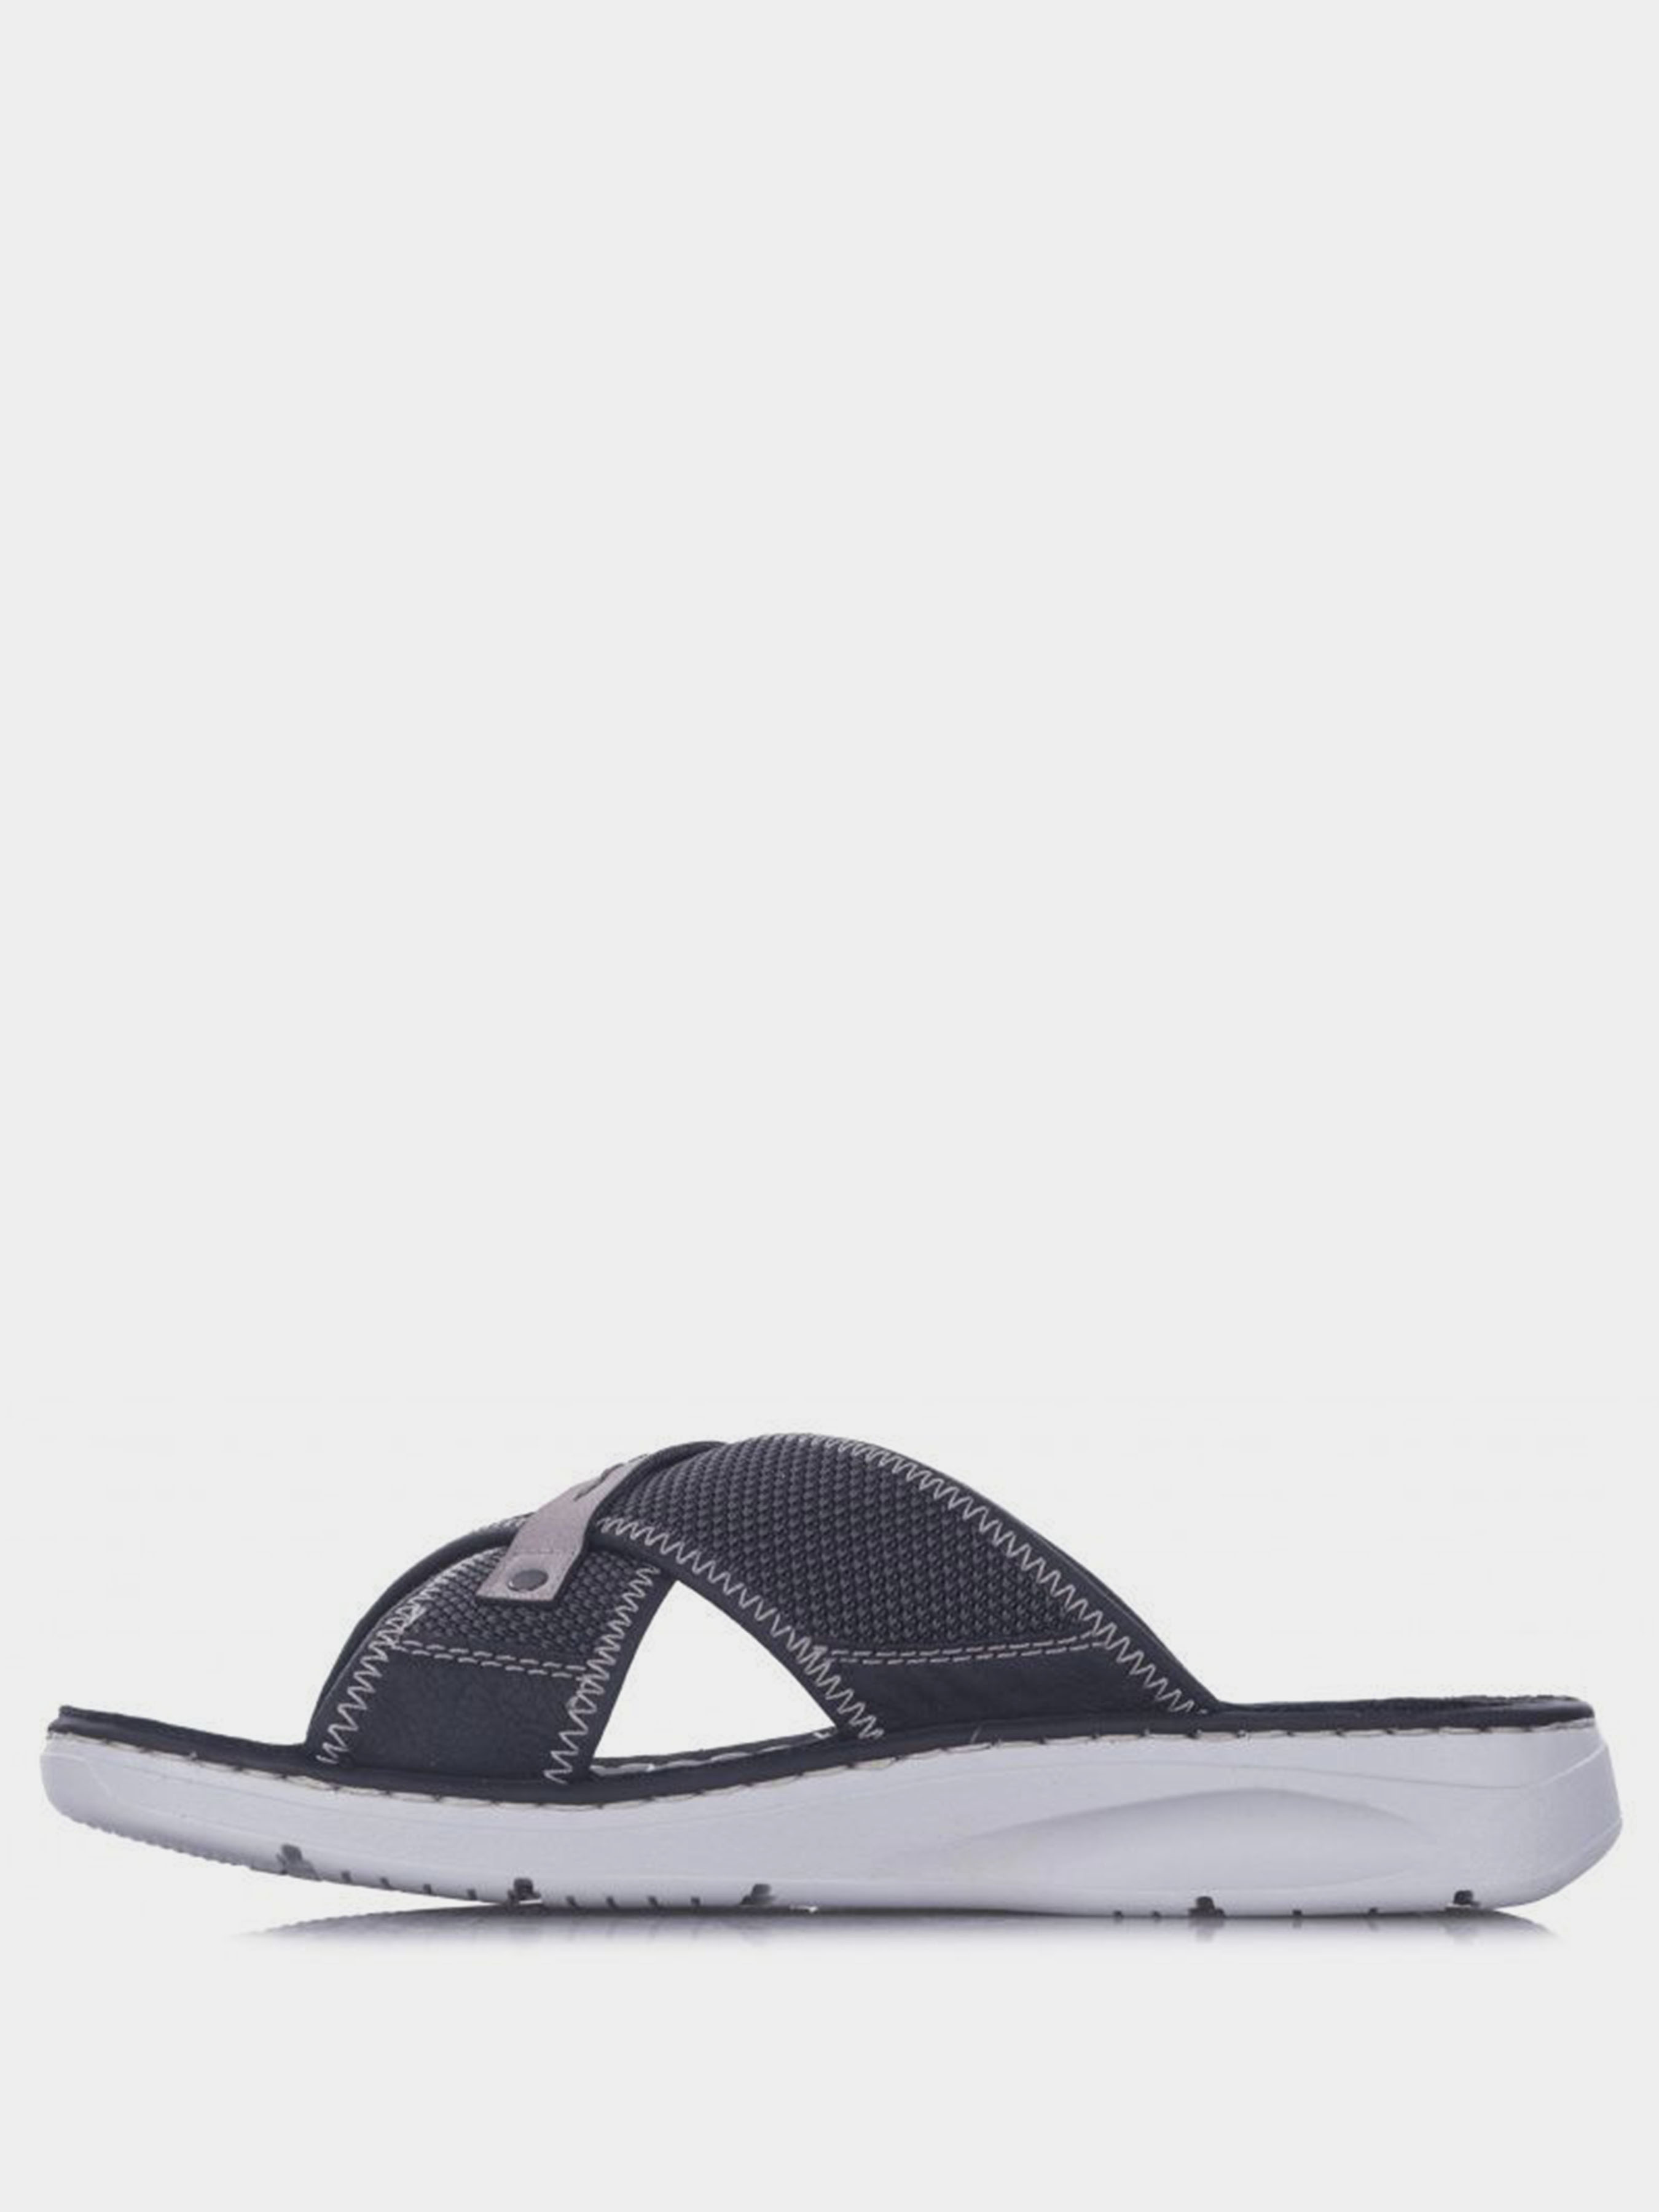 Сандалии для мужчин RIEKER RK581 размерная сетка обуви, 2017